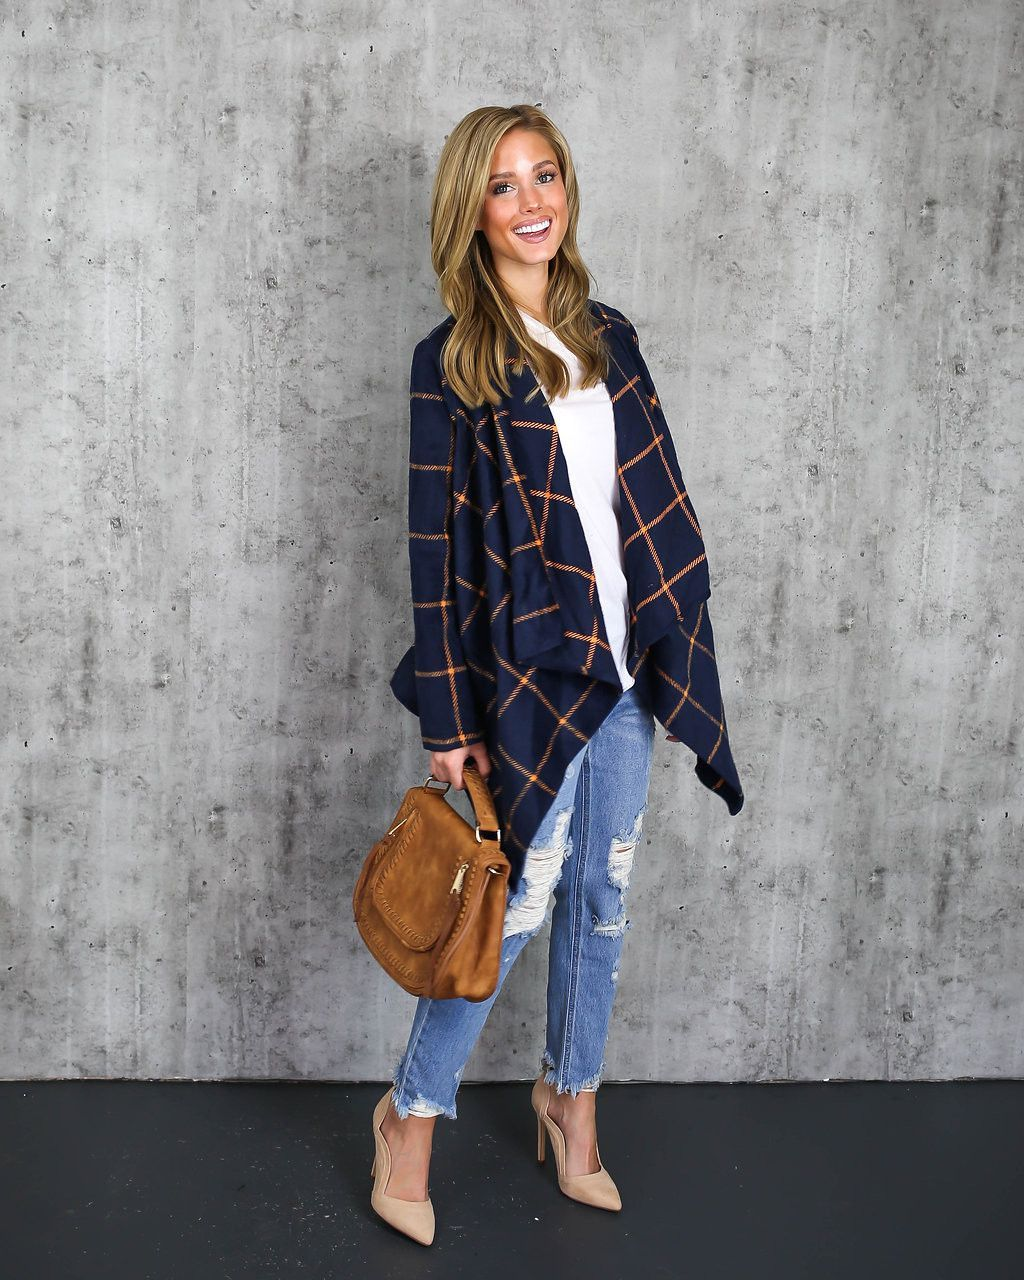 Estate Plaid Jacket | Plaid jacket, Casual weekend style ...